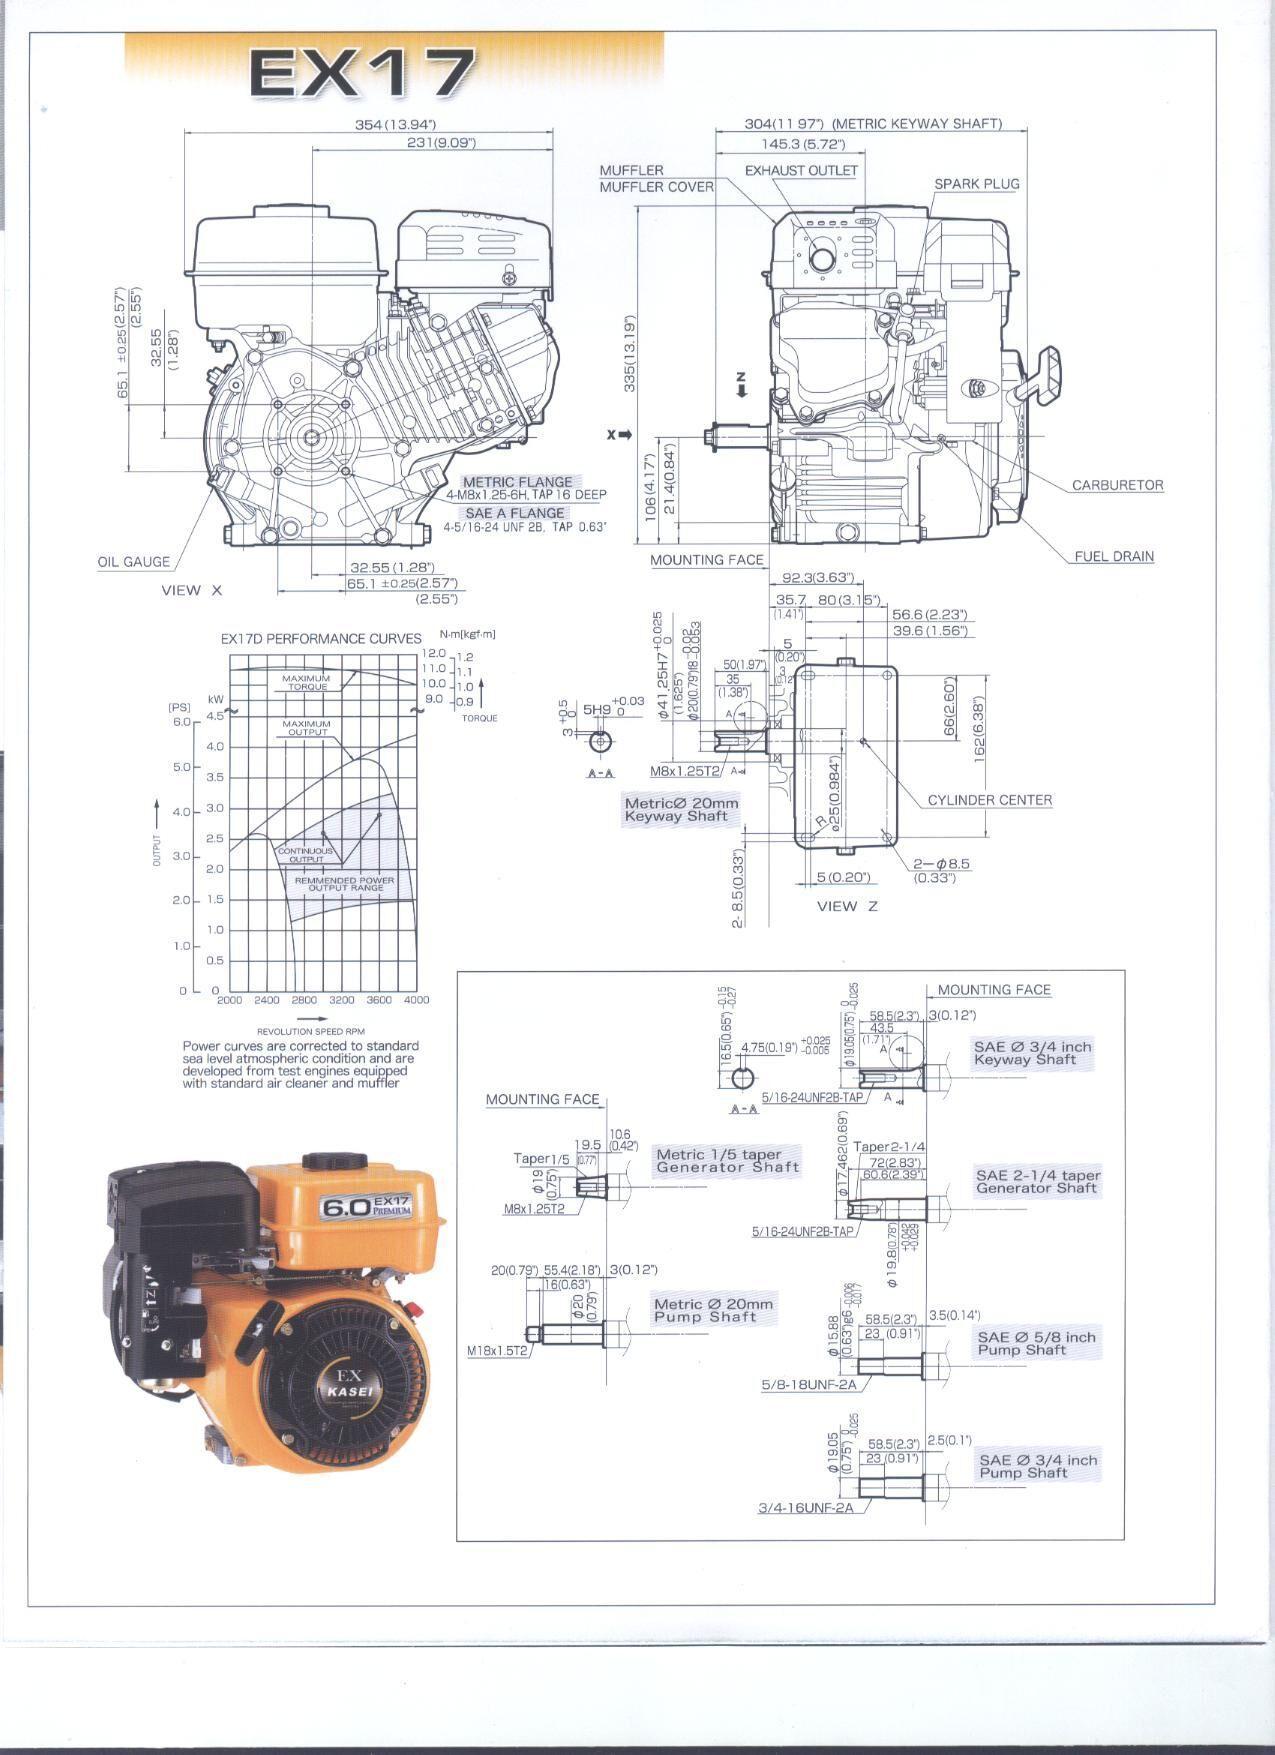 SPARE PARTS OF EX17 SUBARU GASOLINE ENGINE   8